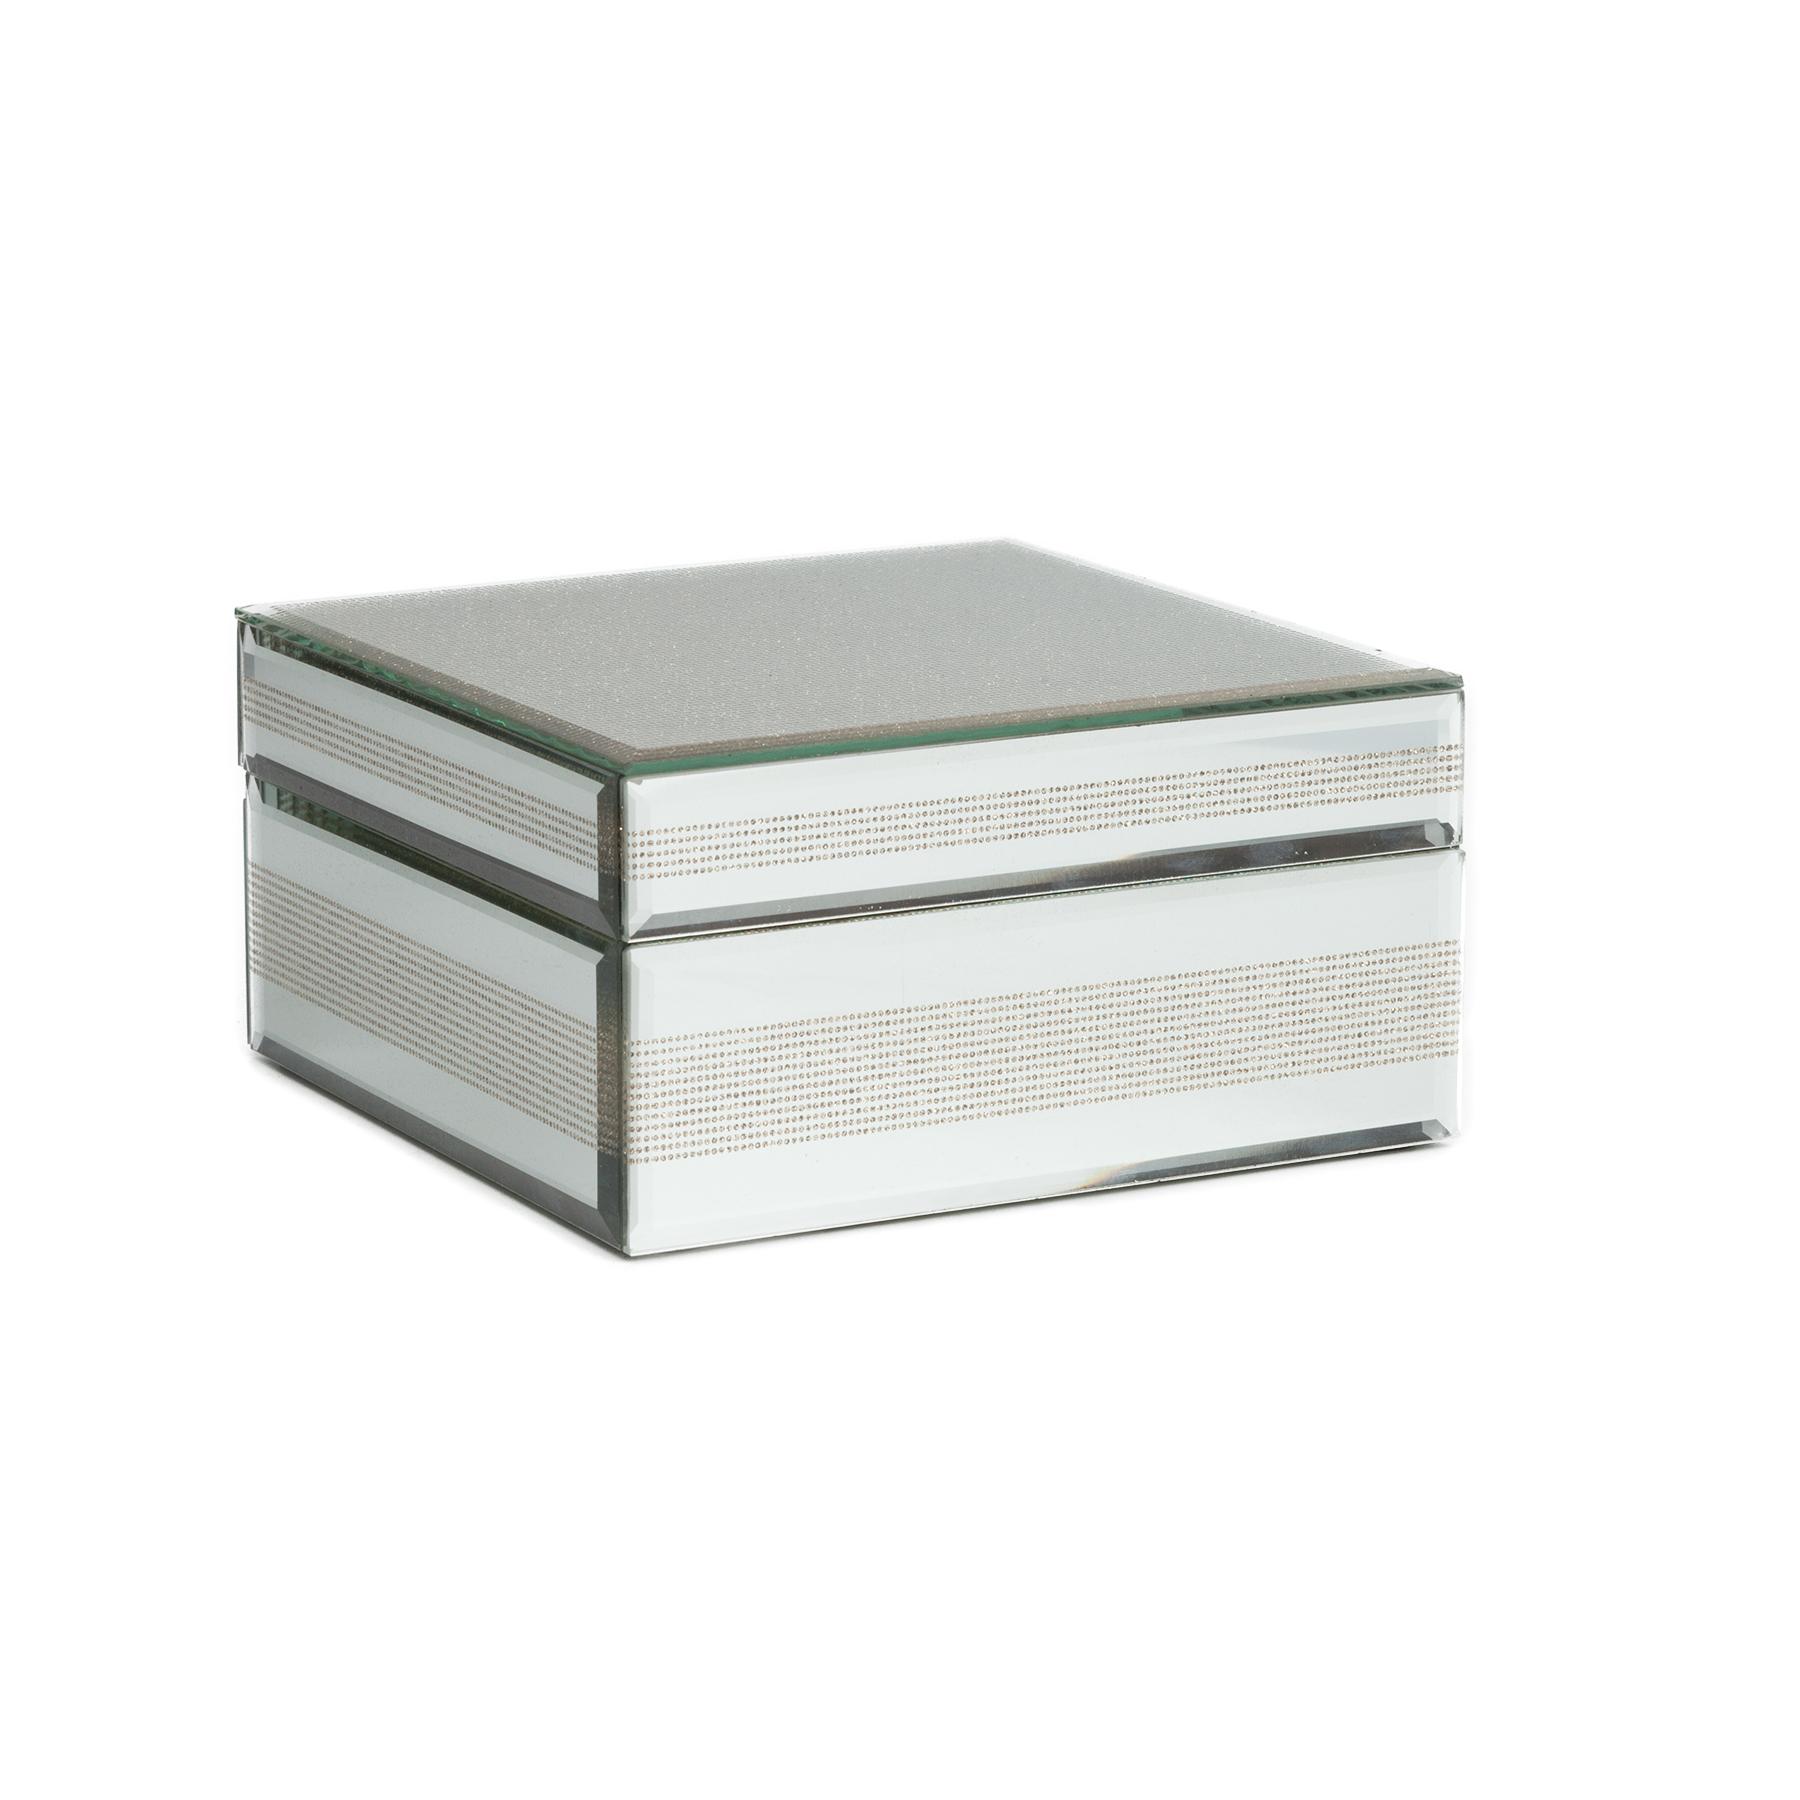 Зеркальная декоративная коробка AntiquedКоробки<br>Материал: МДФ, Зеркало<br><br>Material: МДФ<br>Length см: None<br>Width см: 18<br>Depth см: 18<br>Height см: 9